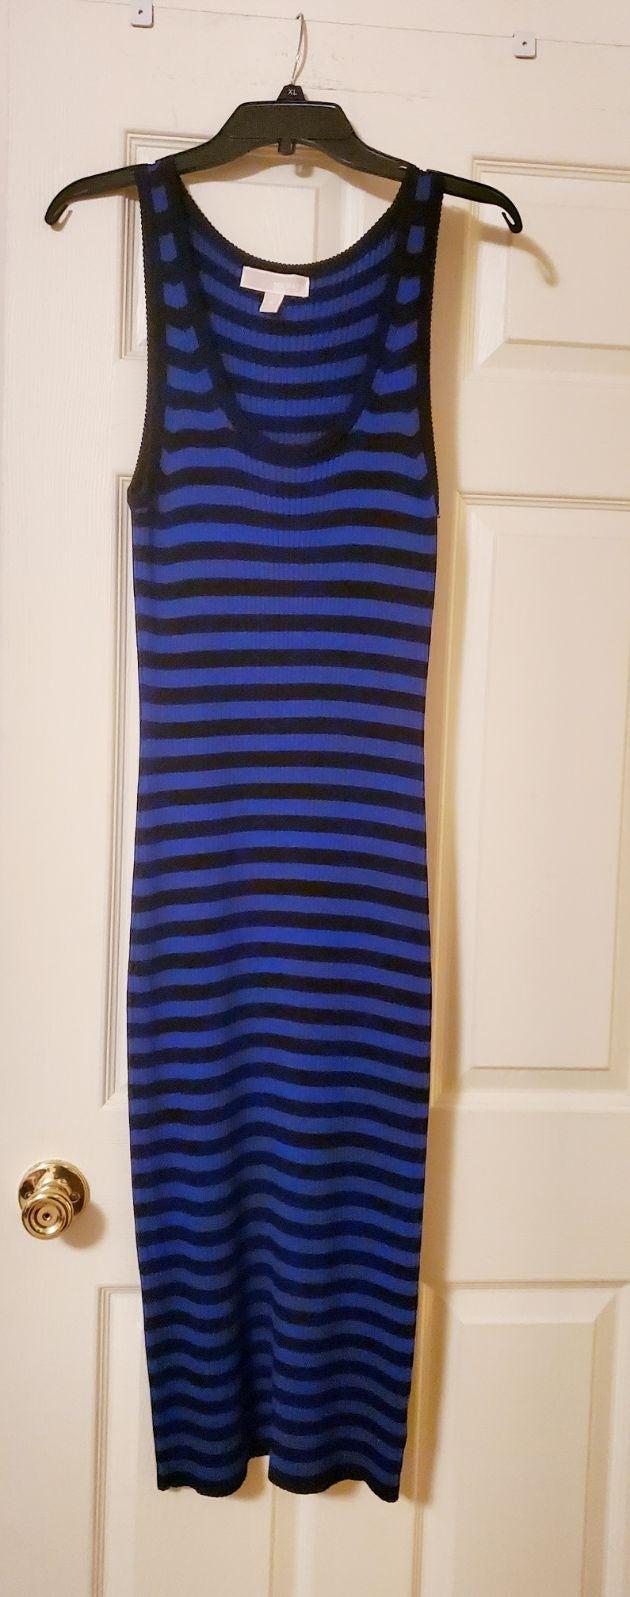 Michael Kors tank dress